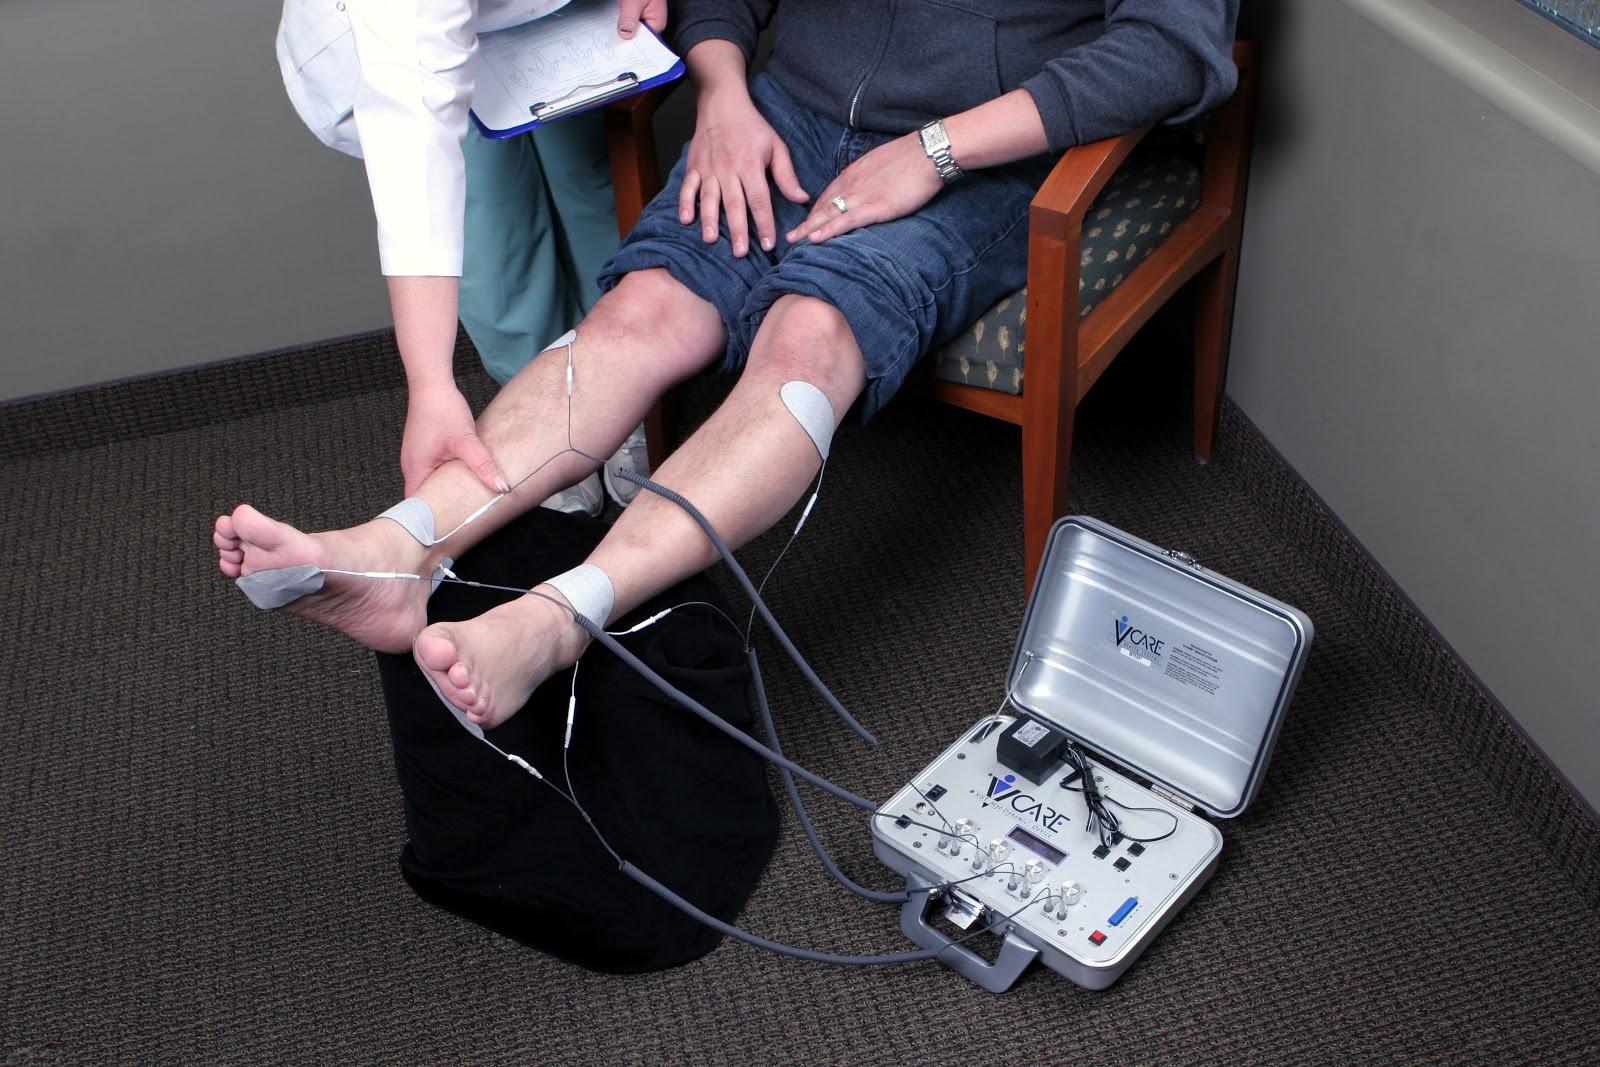 neuropathy treatment machine